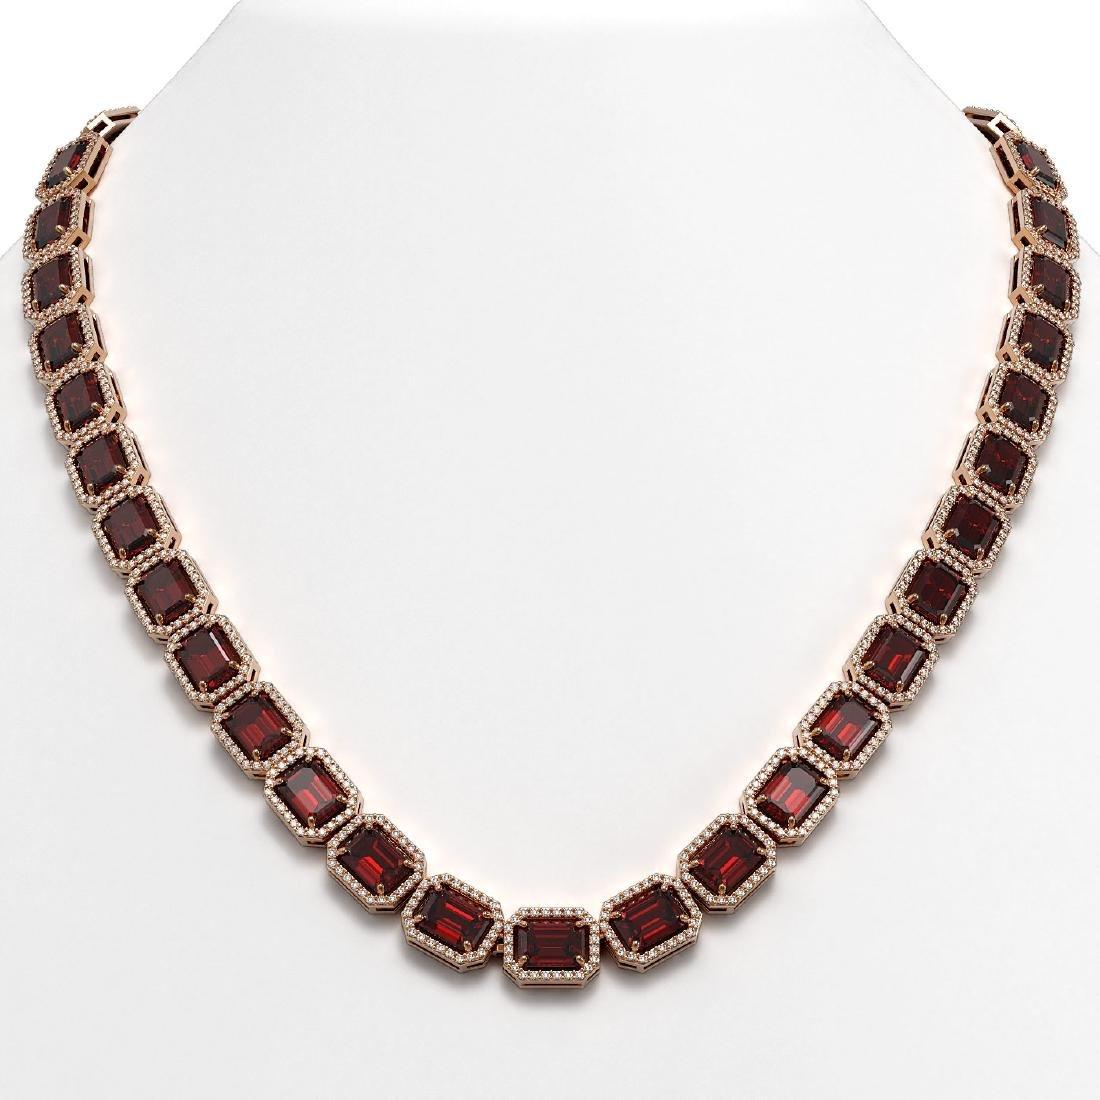 60.59 CTW Garnet & Diamond Halo Necklace 10K Rose Gold